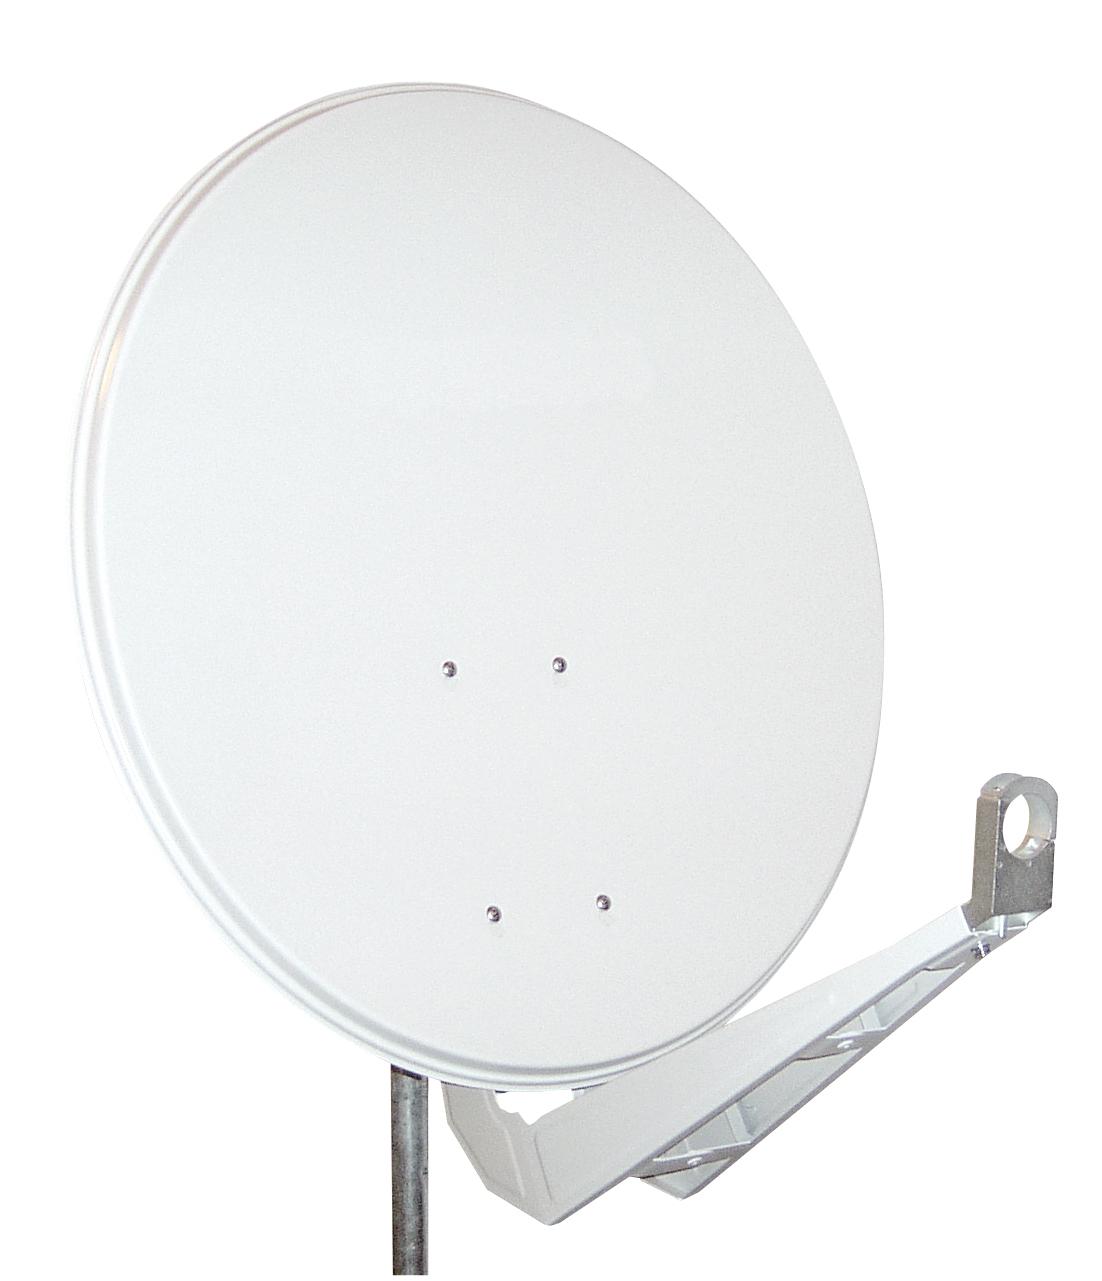 1 Stk SAT Antenne 100/95cm,Alu,>40dB Gain,Doppel Monoblok Arm,Weiß HSATA100AW